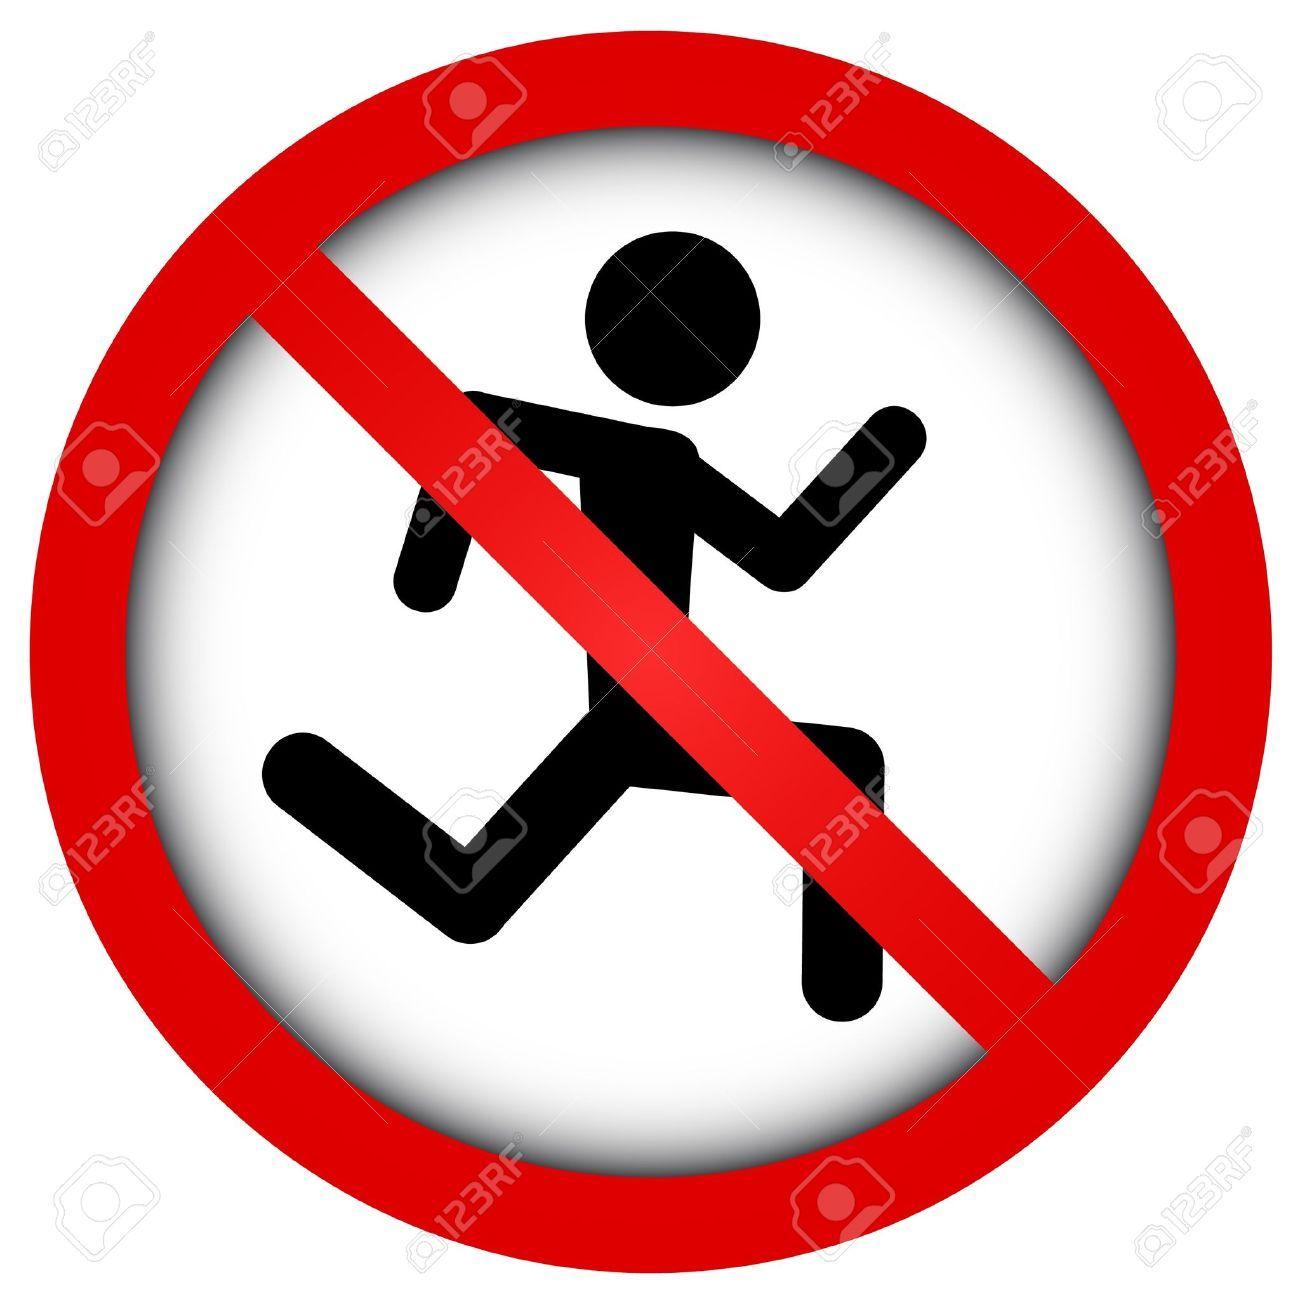 No running clipart 4 » Clipart Portal.